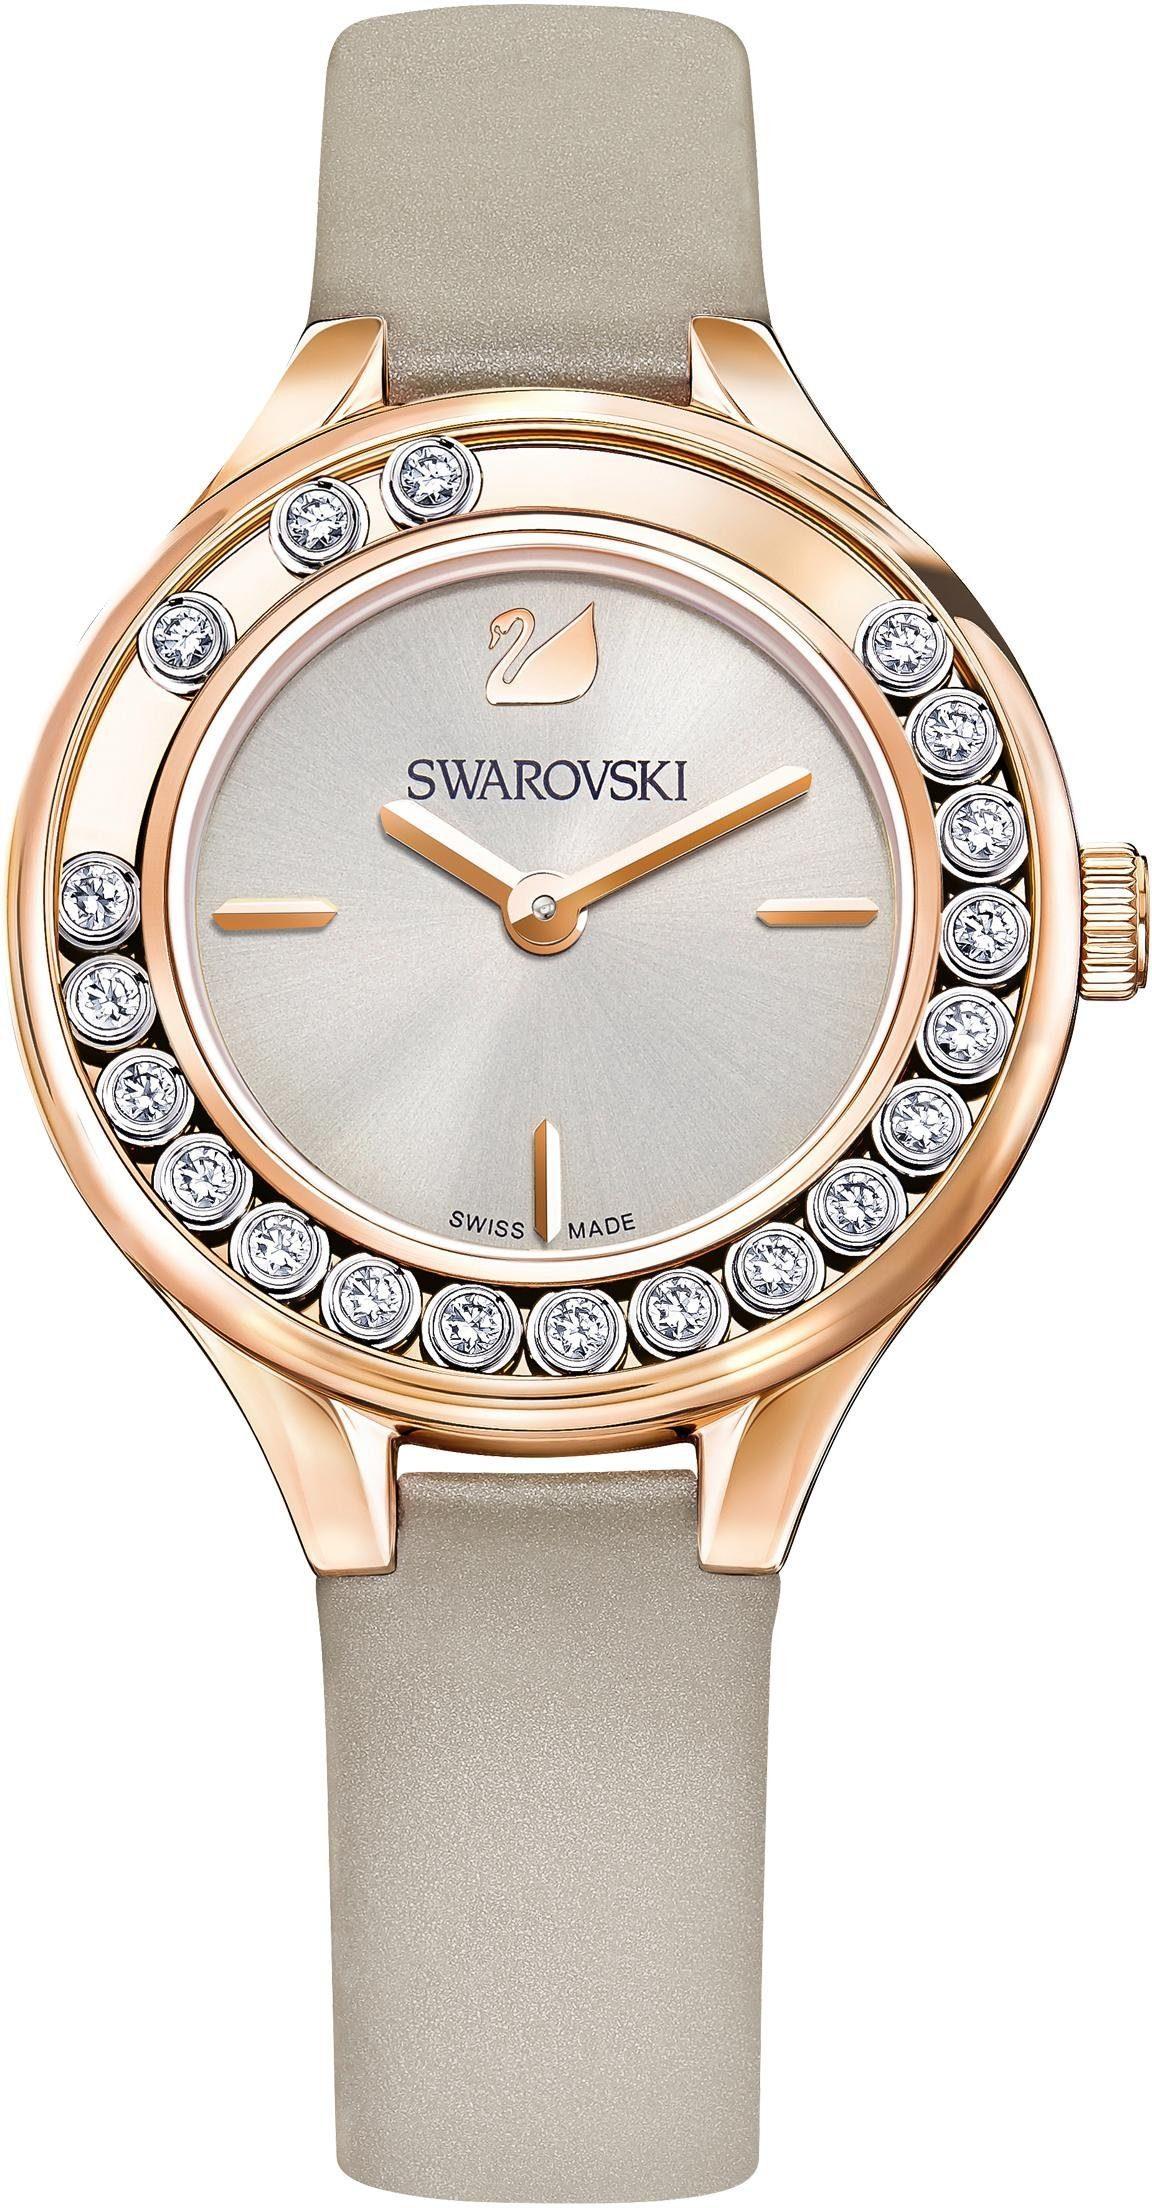 Swarovski Schweizer Uhr »Lovely Crystals Mini Uhr, Lederarmband, grau, roséfarben, 5261481«